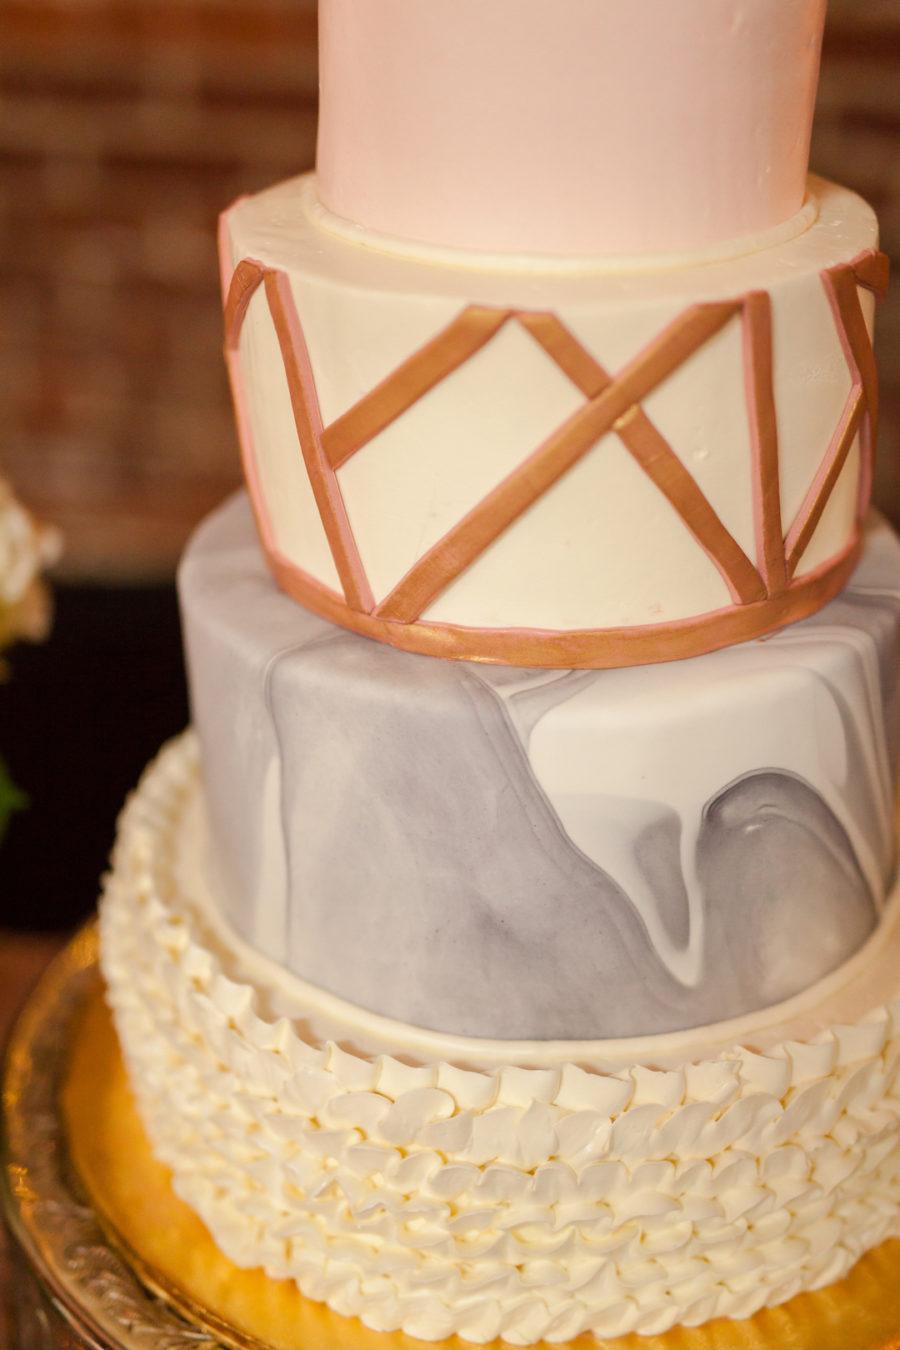 Wedding Cake Design: Romantic Blush & Metallic Wedding at Depot Square featured on Nashville Bride Guide